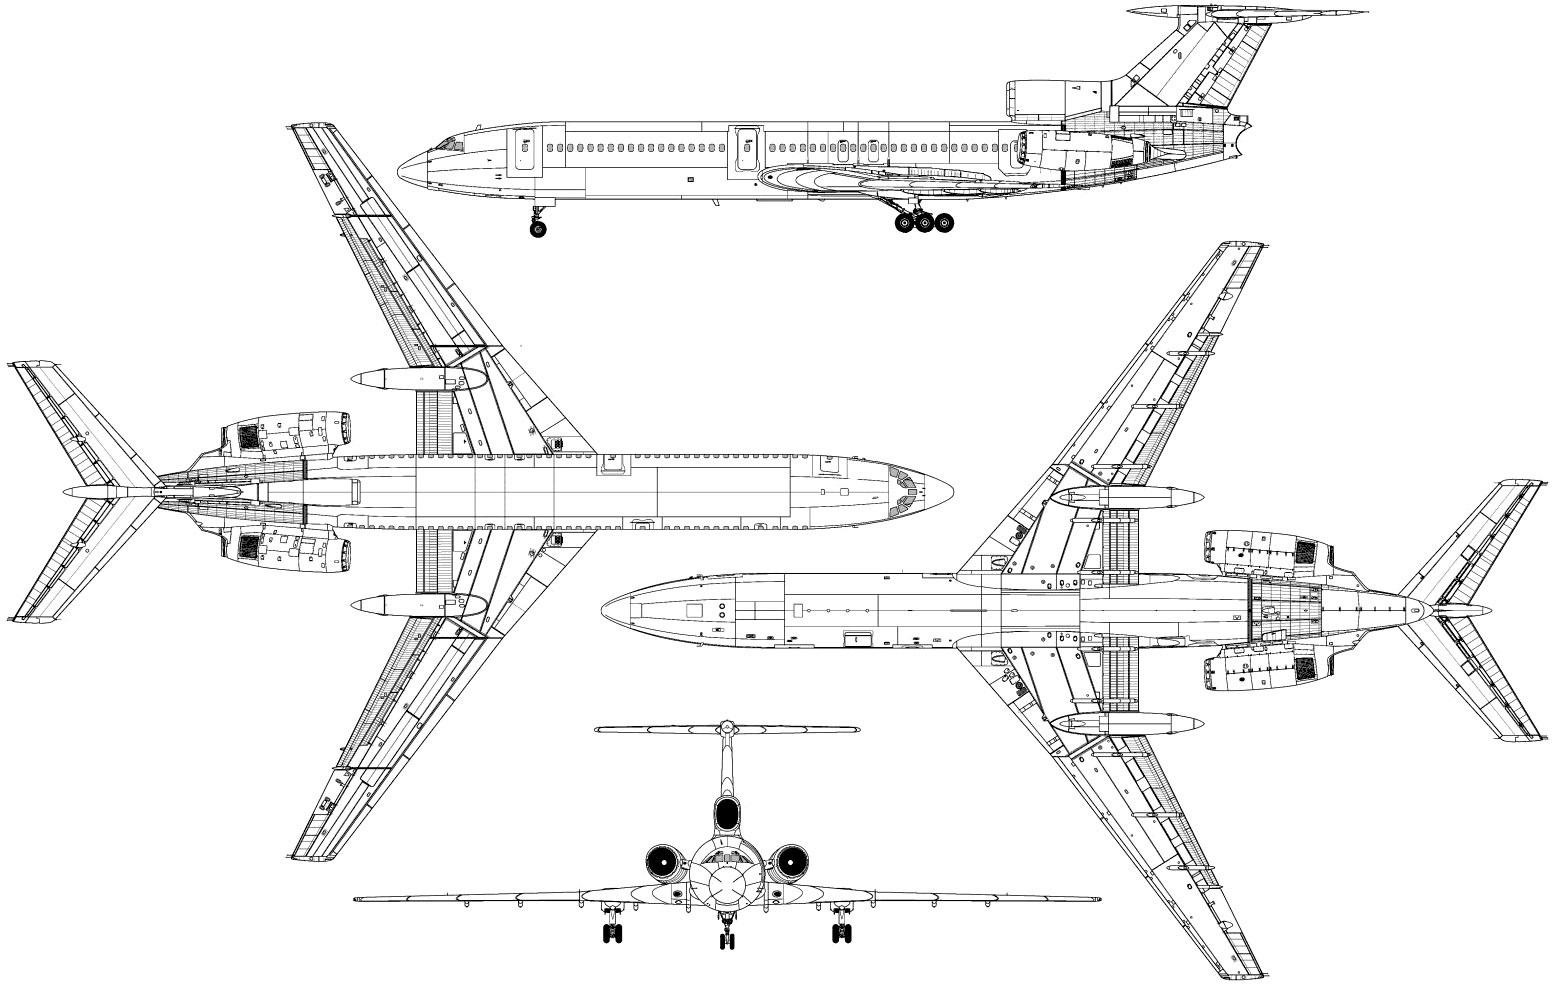 Tu-154 blueprint